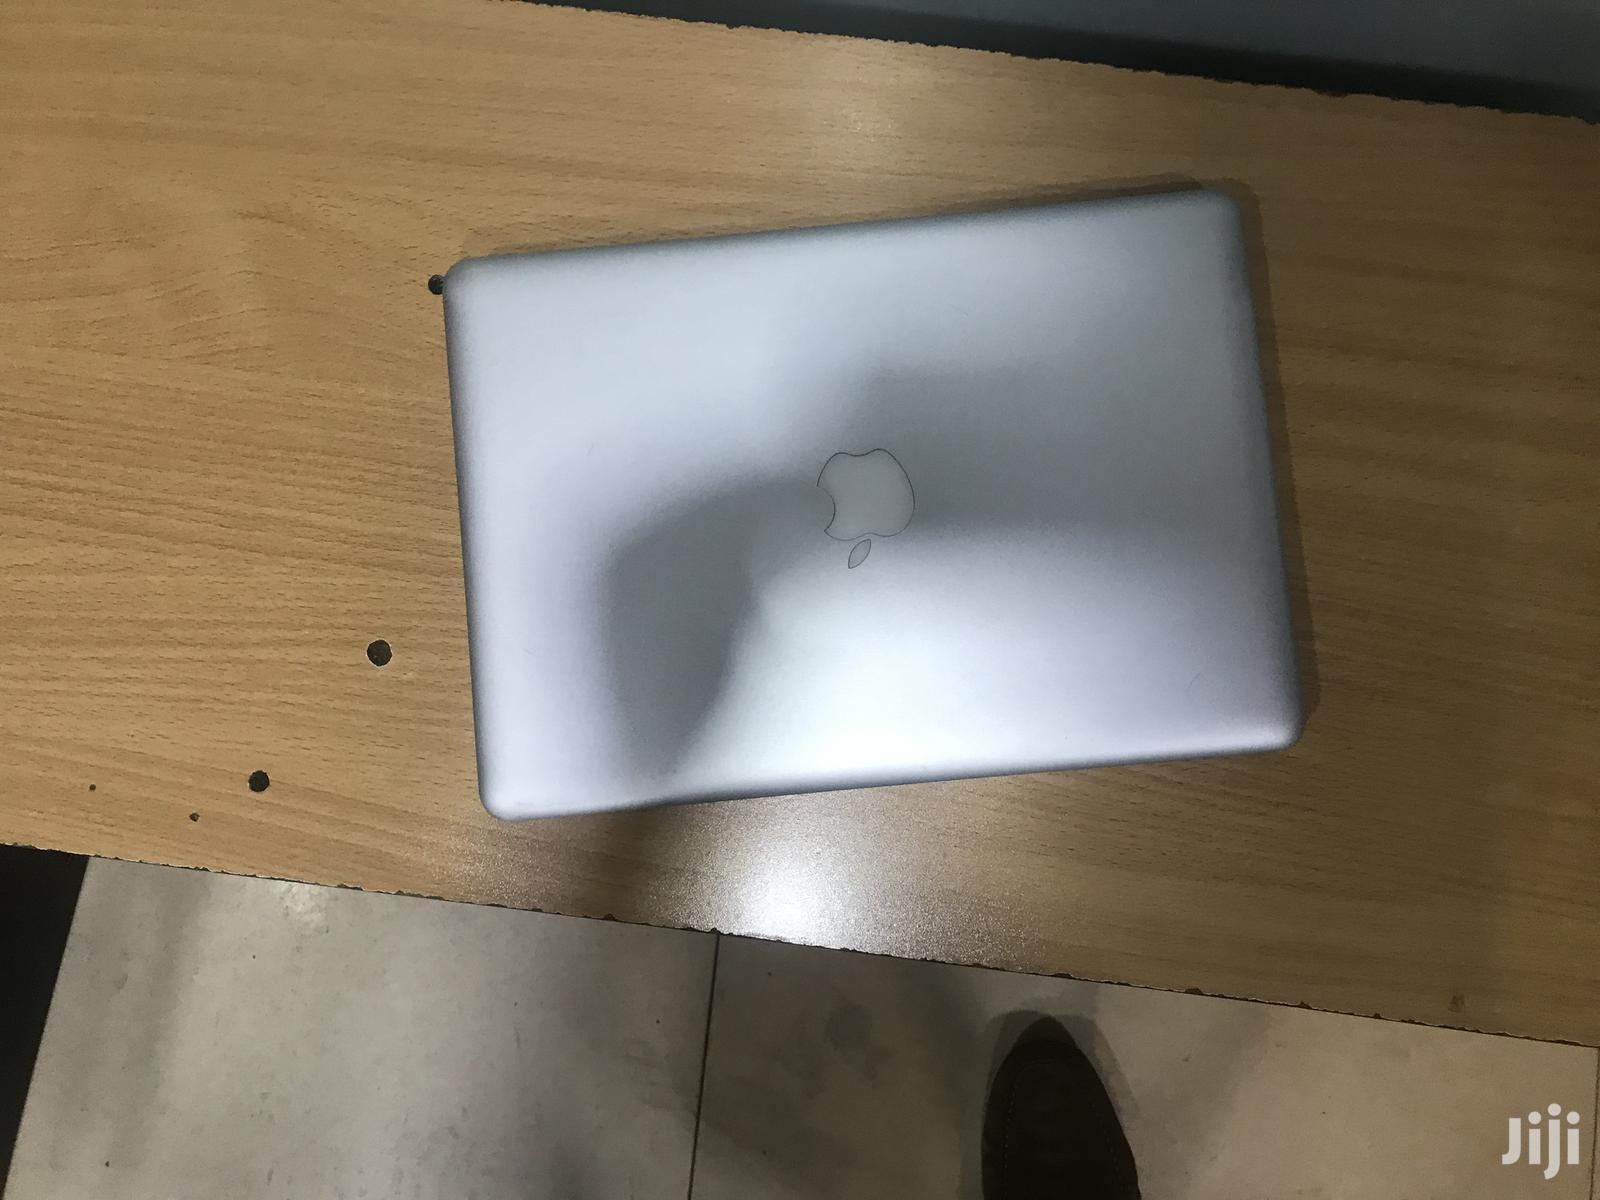 Laptop Apple MacBook Pro 8GB Intel Core I5 HDD 500GB   Laptops & Computers for sale in Kampala, Central Region, Uganda